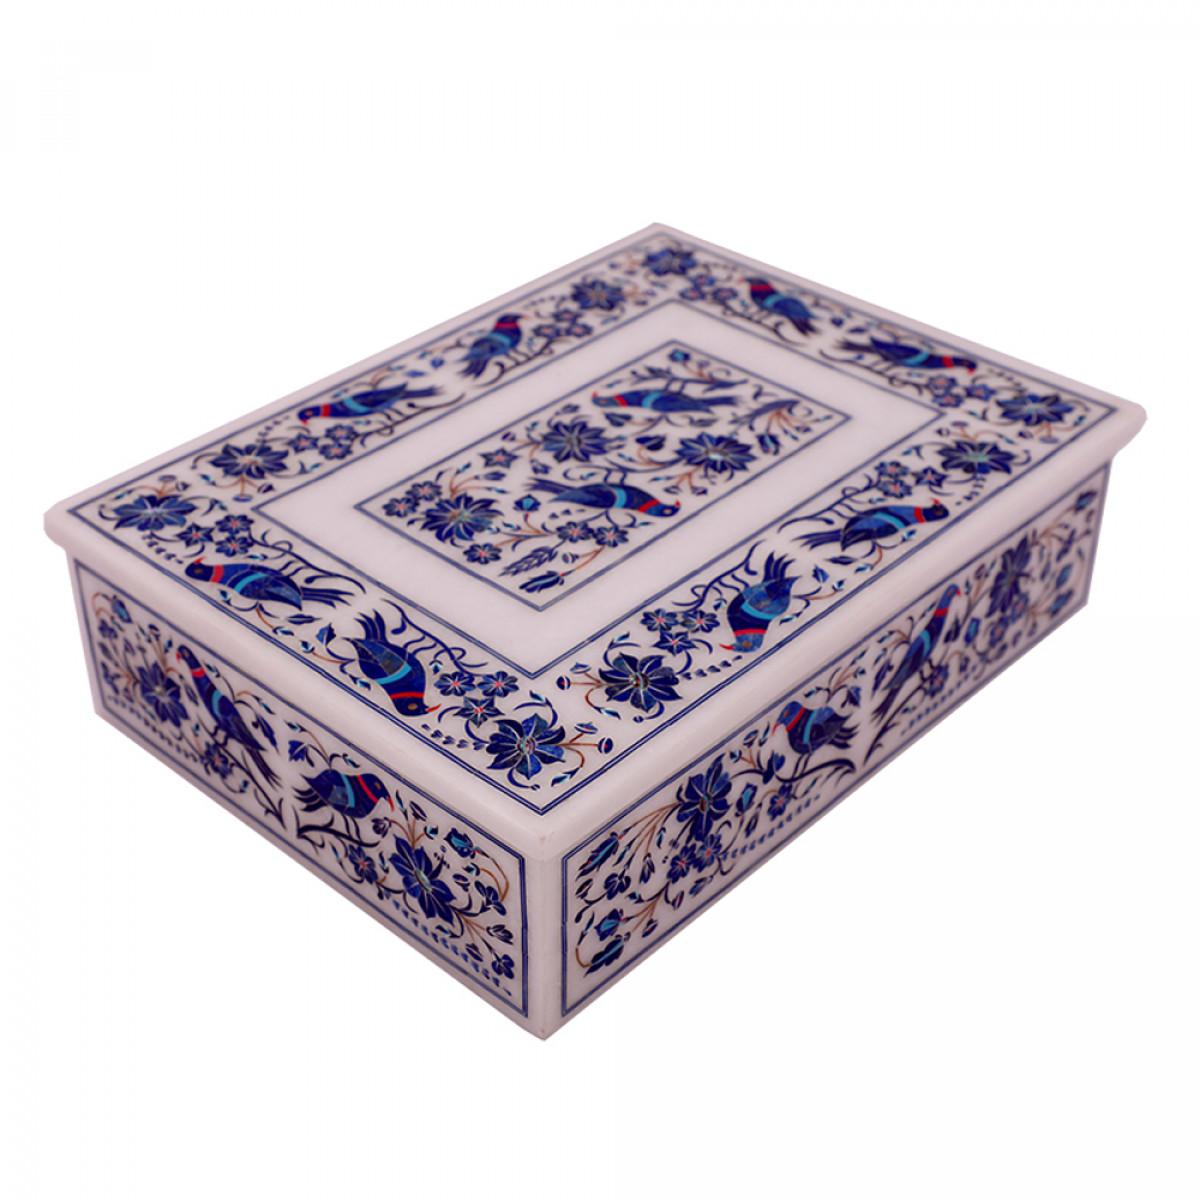 Hand Crafted Pietra Dura Art Inlay Marble Jewelry Box